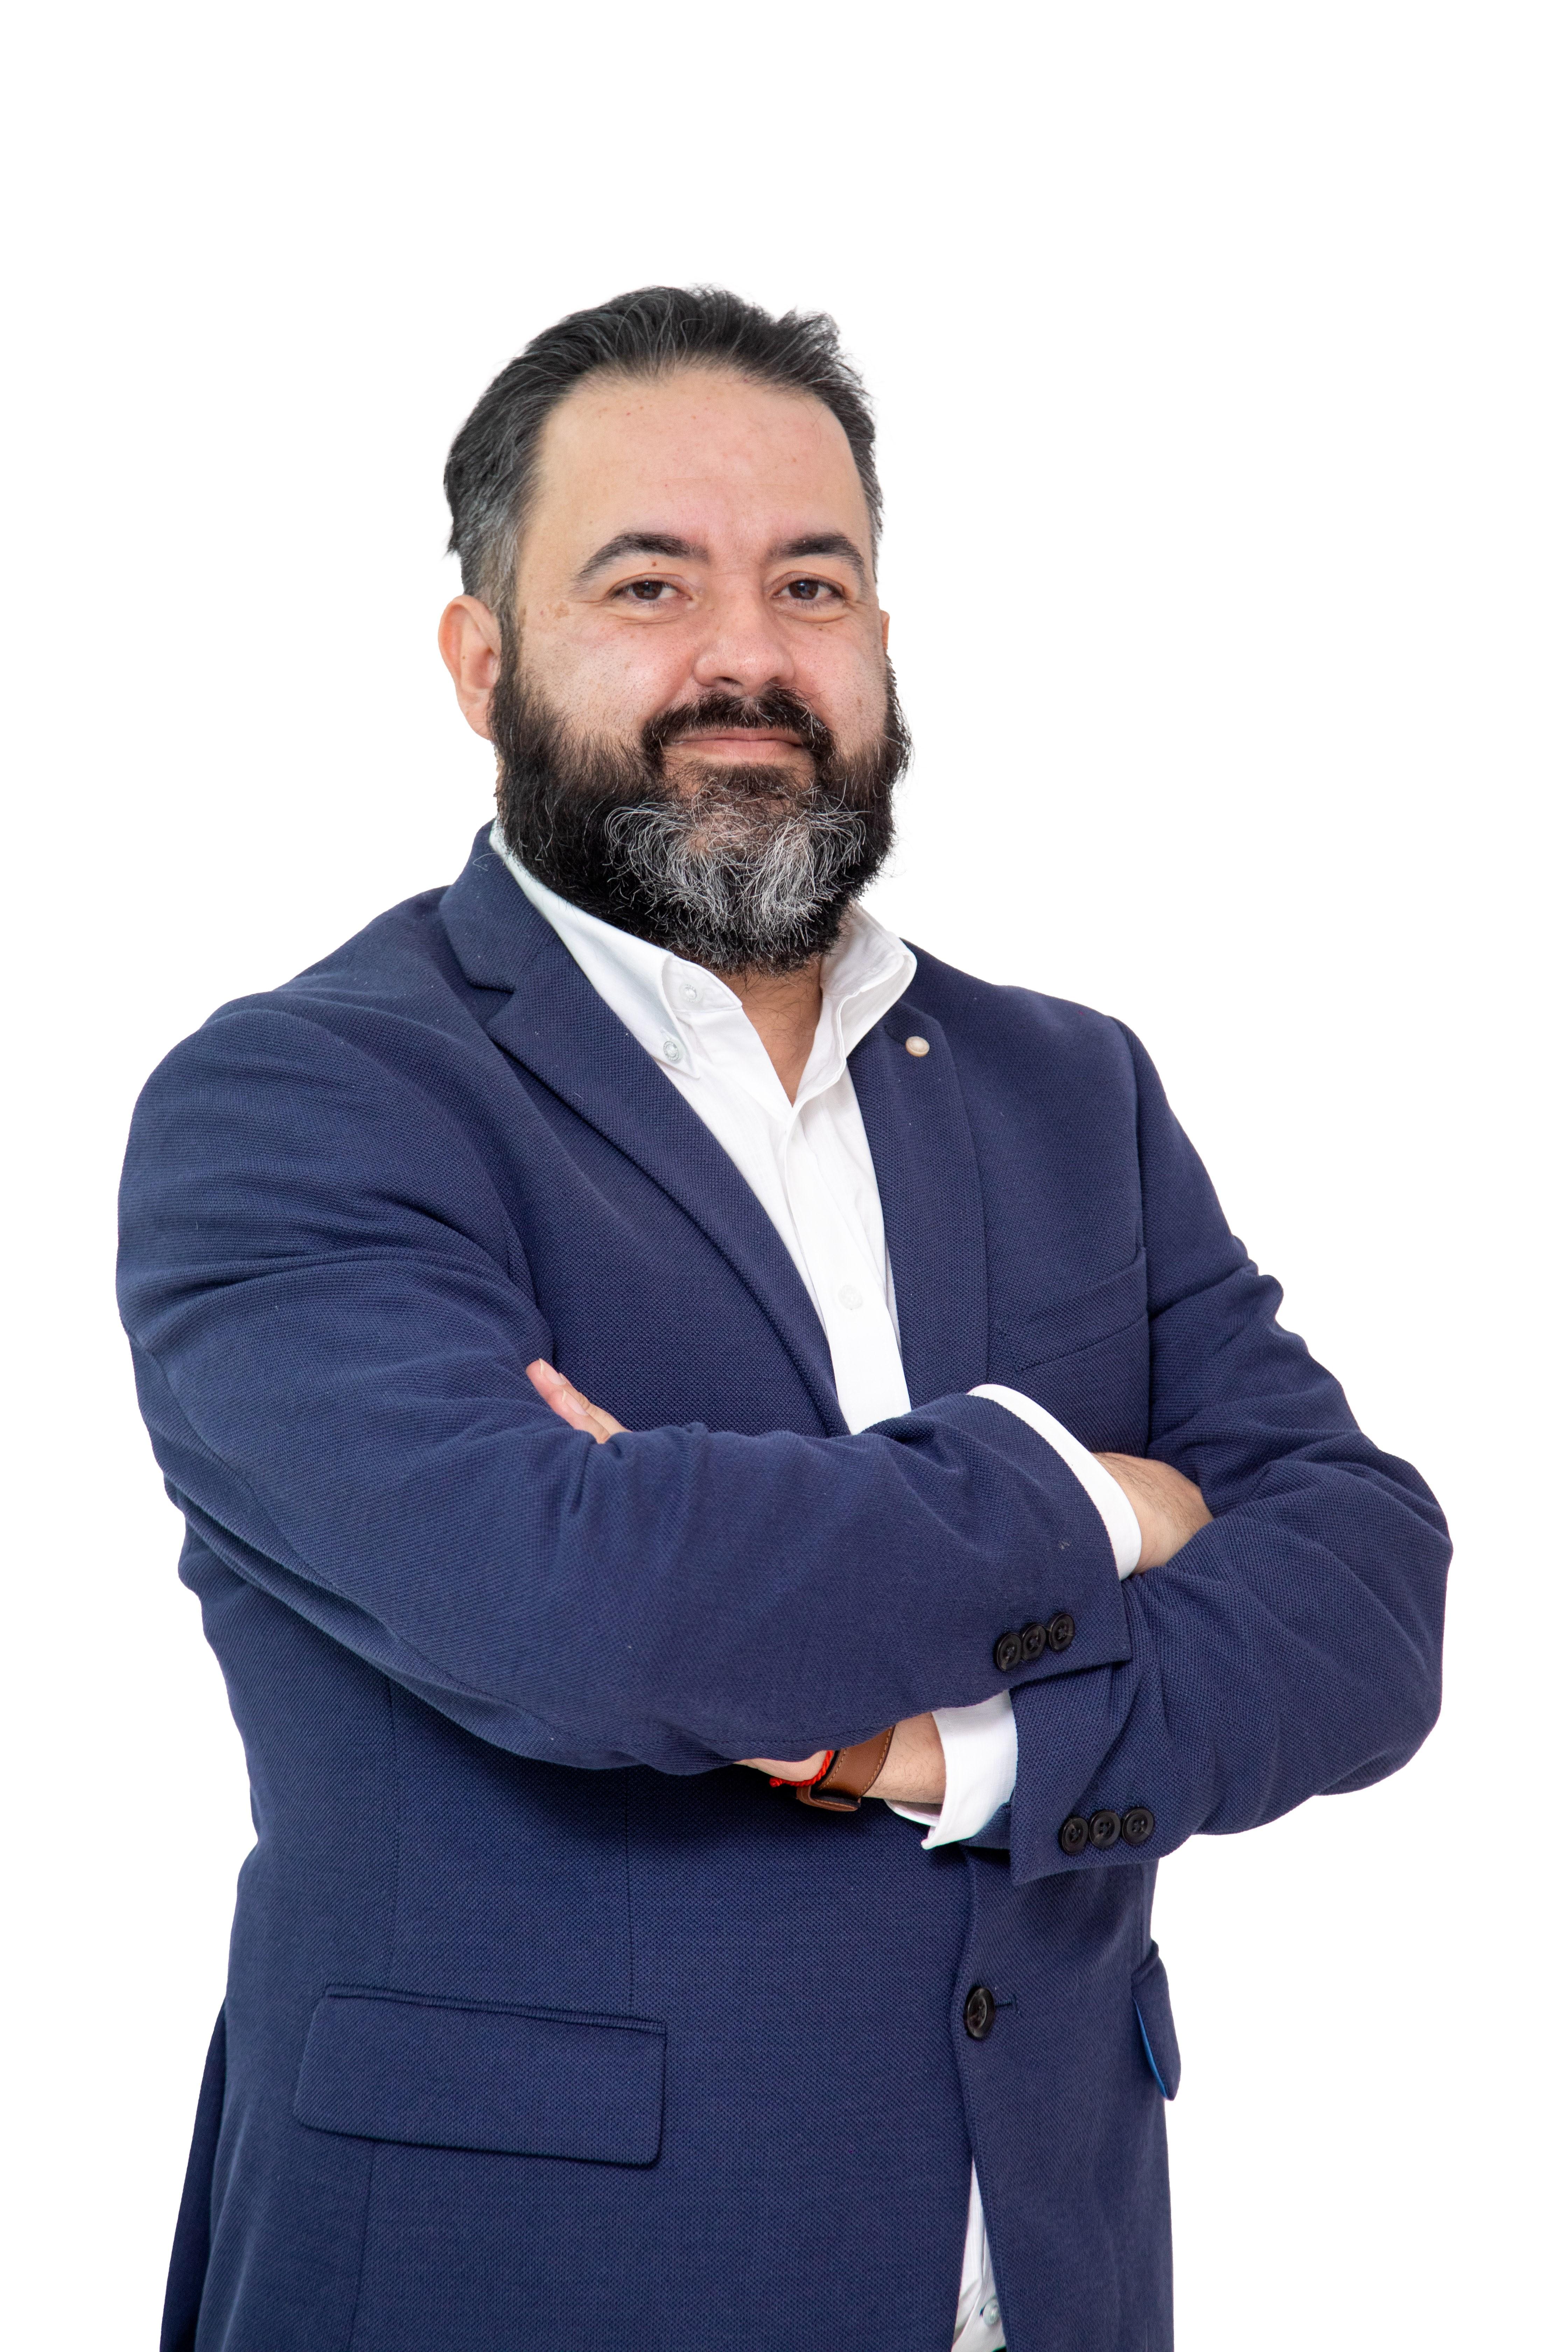 Diego Contreras Parriego